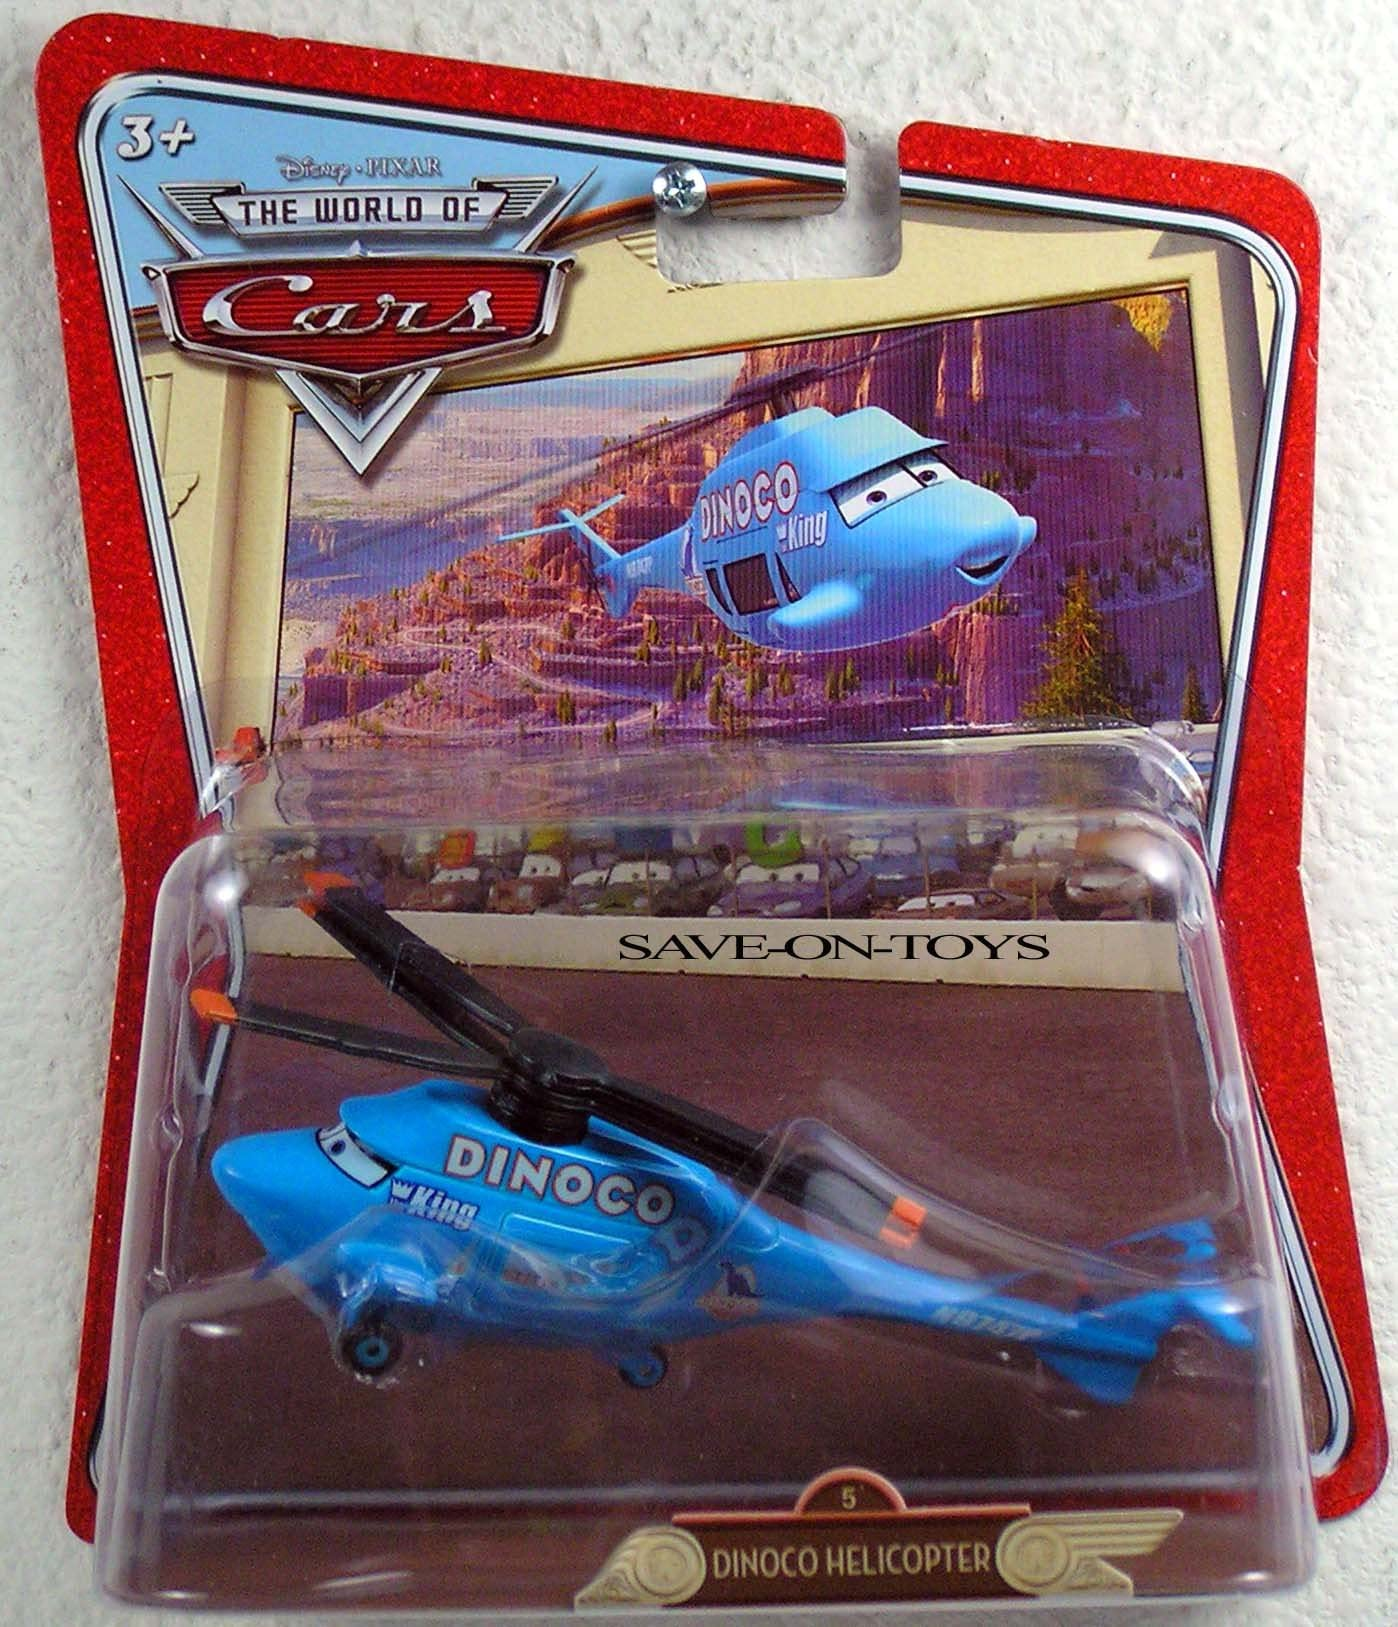 1:55 Disney Pixar Cars Frank Gift Rare Toys Kid Die-Cast Mattel Collection Model